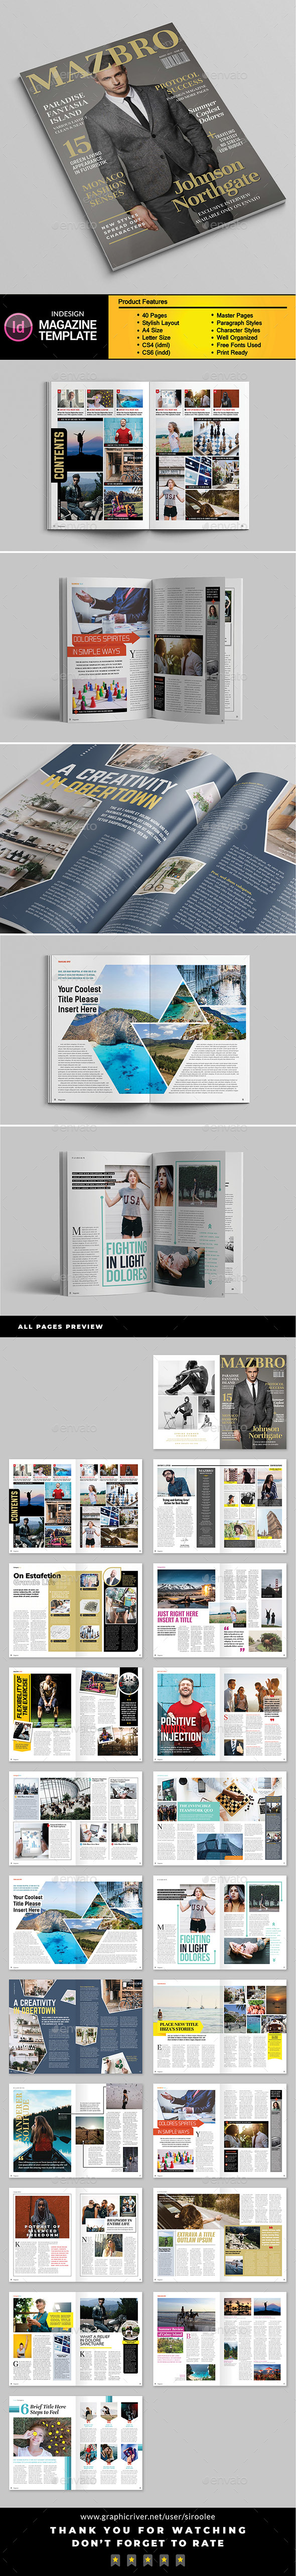 A4 Letter Magazine Vol.03 - Magazines Print Templates